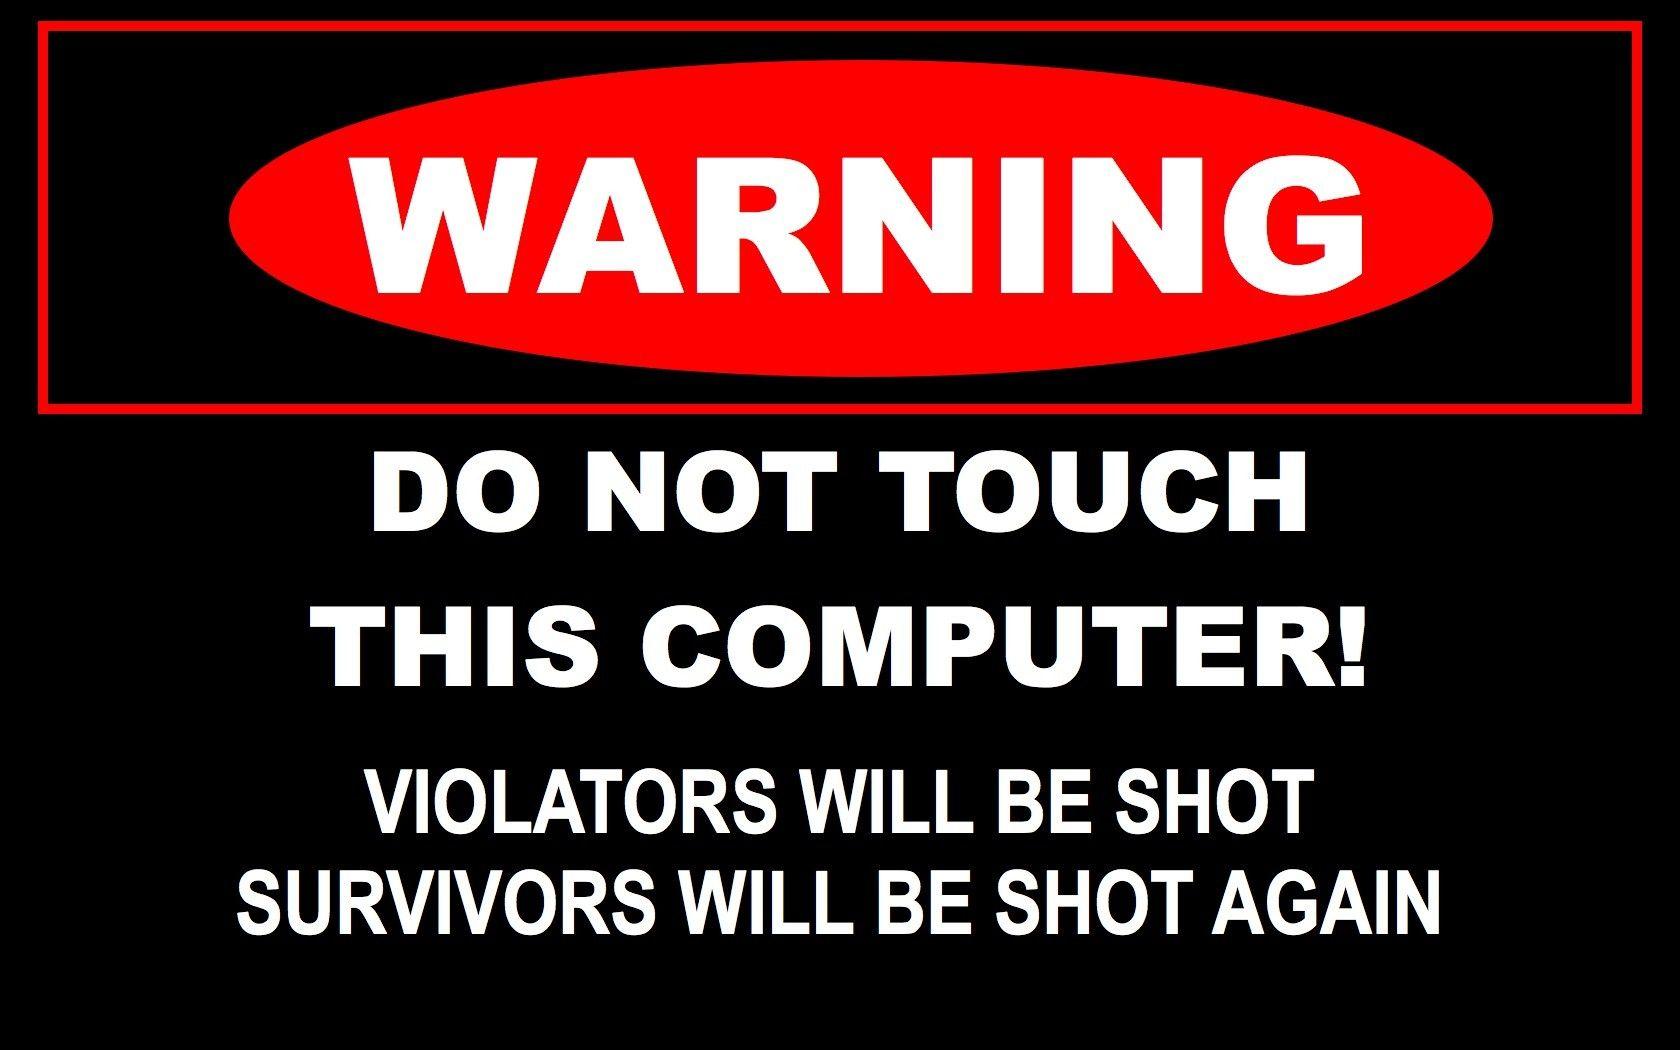 Humor - Warning - Humor Wallpaper | Quotes | Pinterest ...